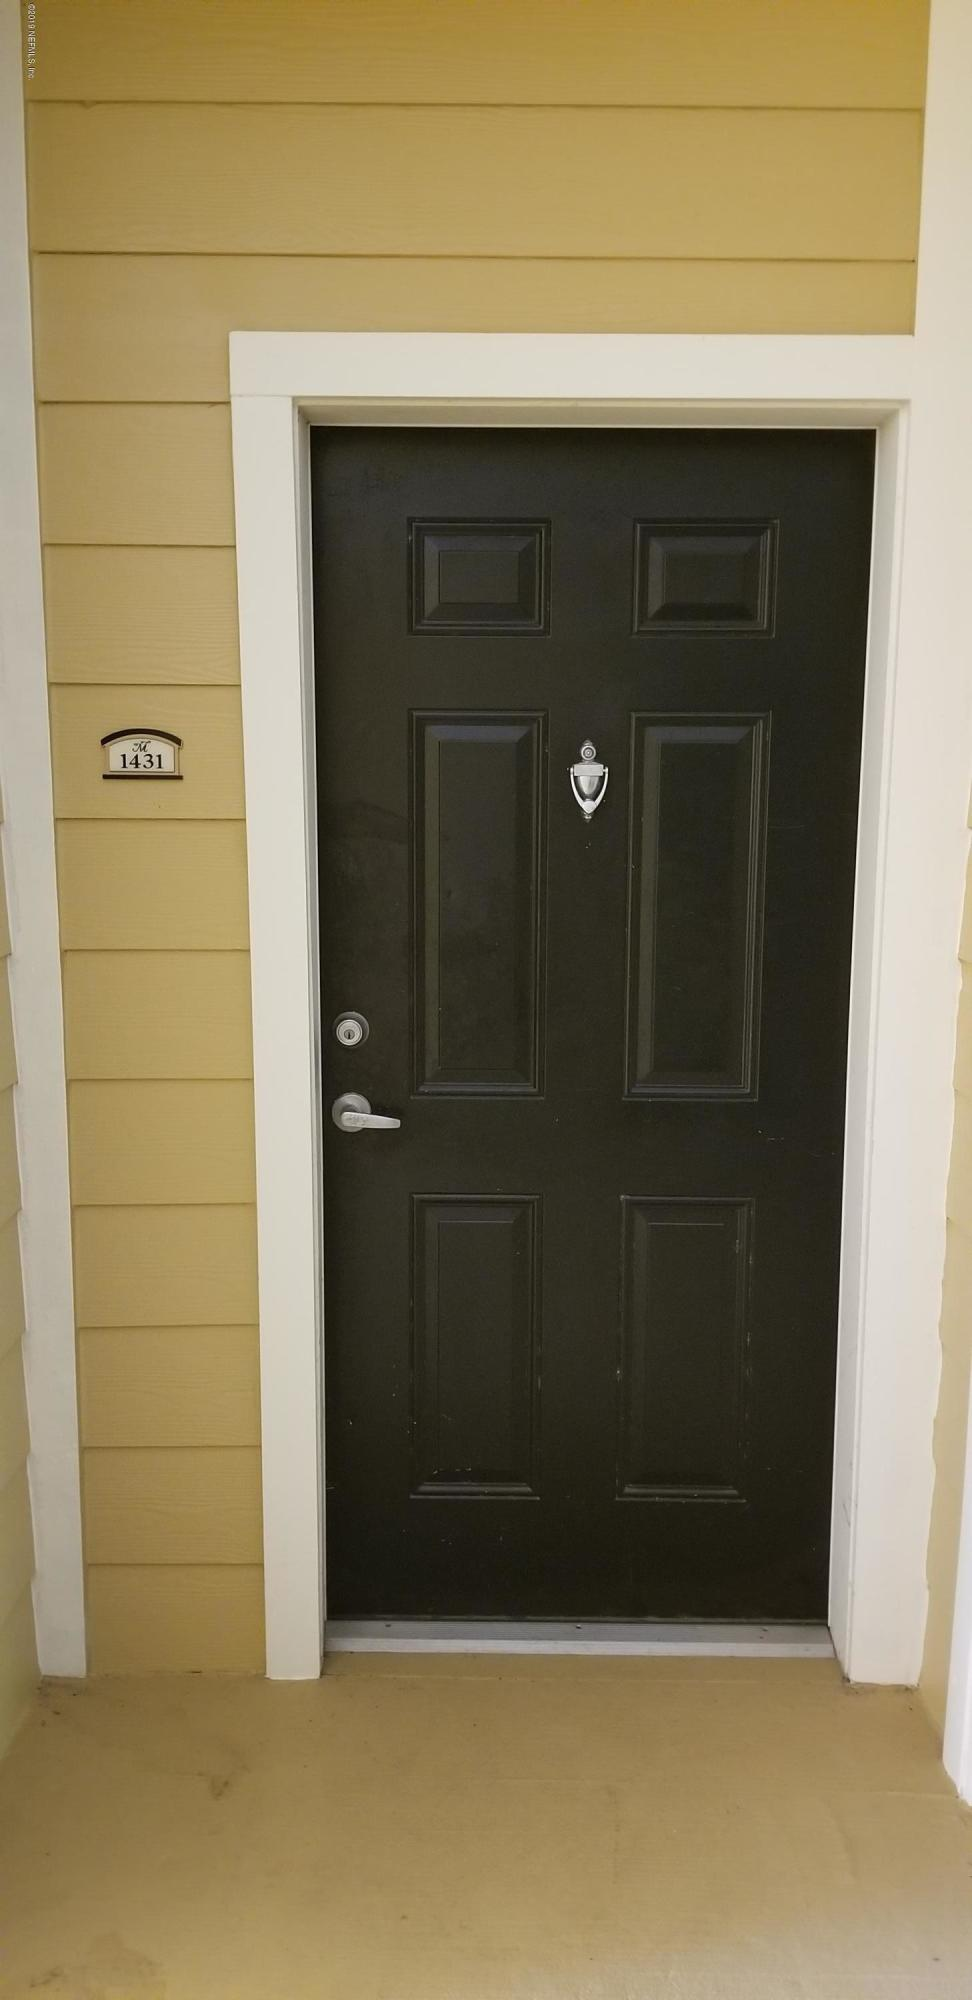 8539 GATE PKWY JACKSONVILLE - 1